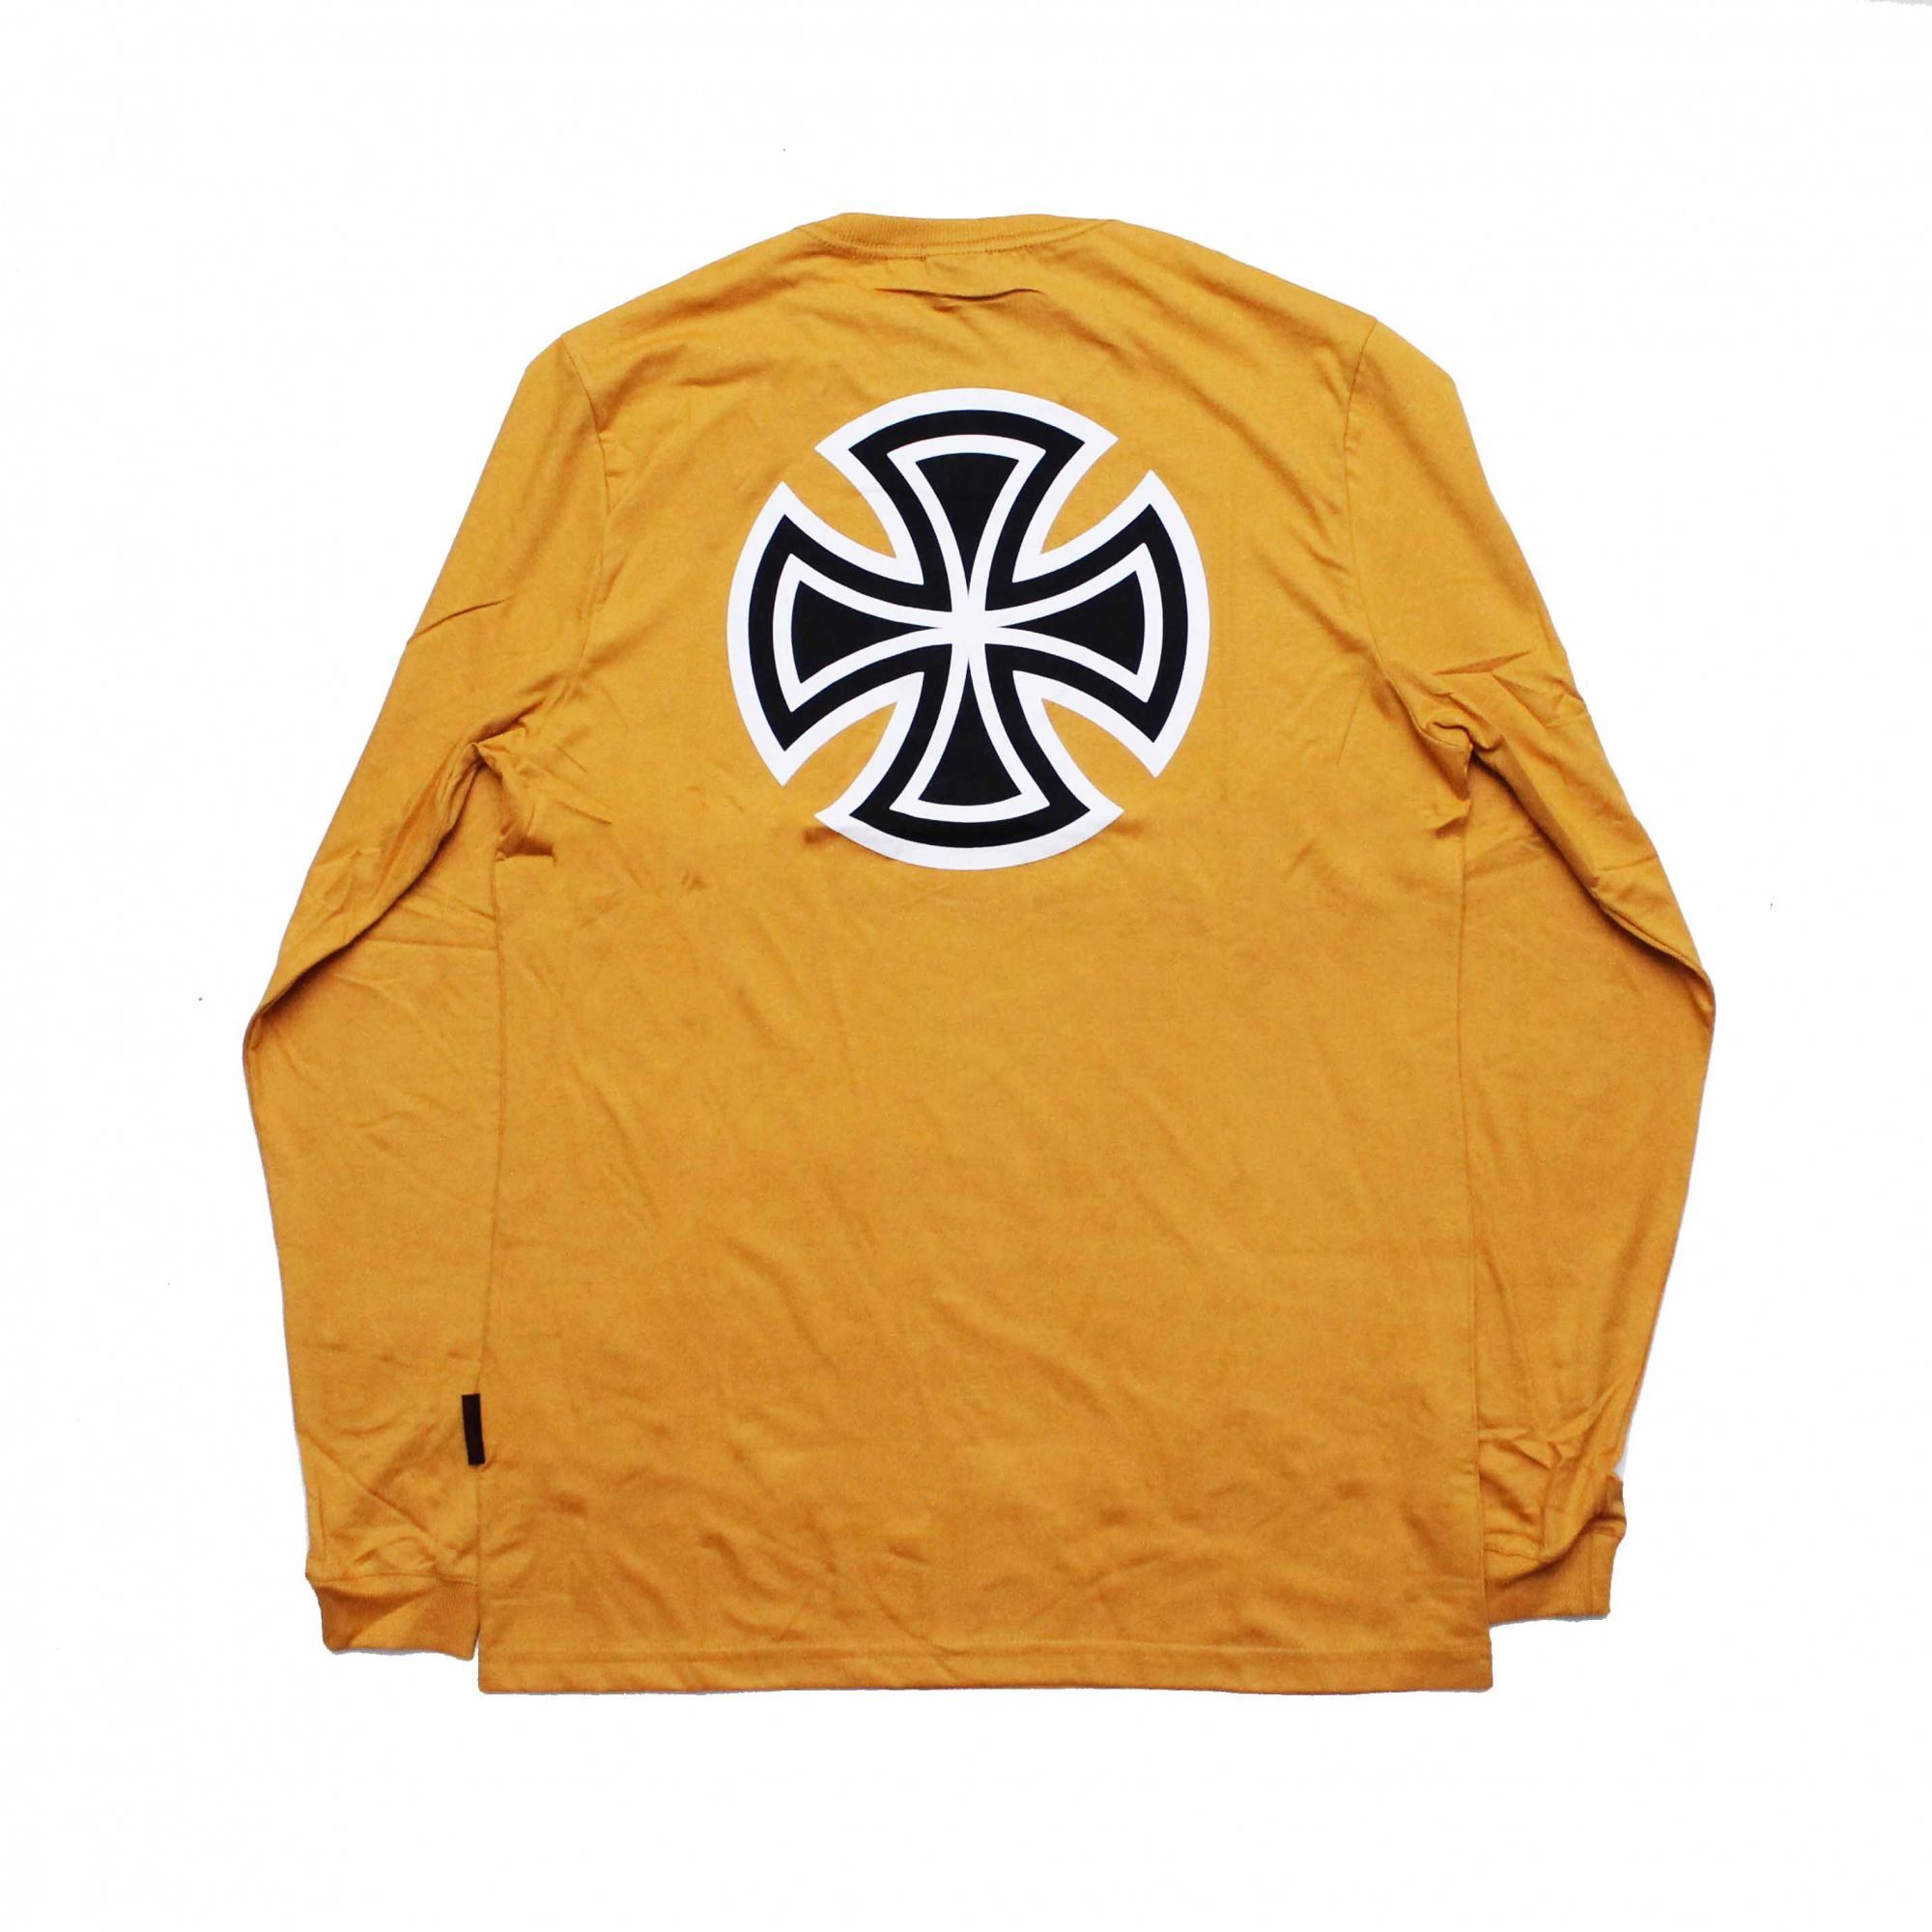 Camiseta Manga Longa Independent Black Bar Cross Amarelo